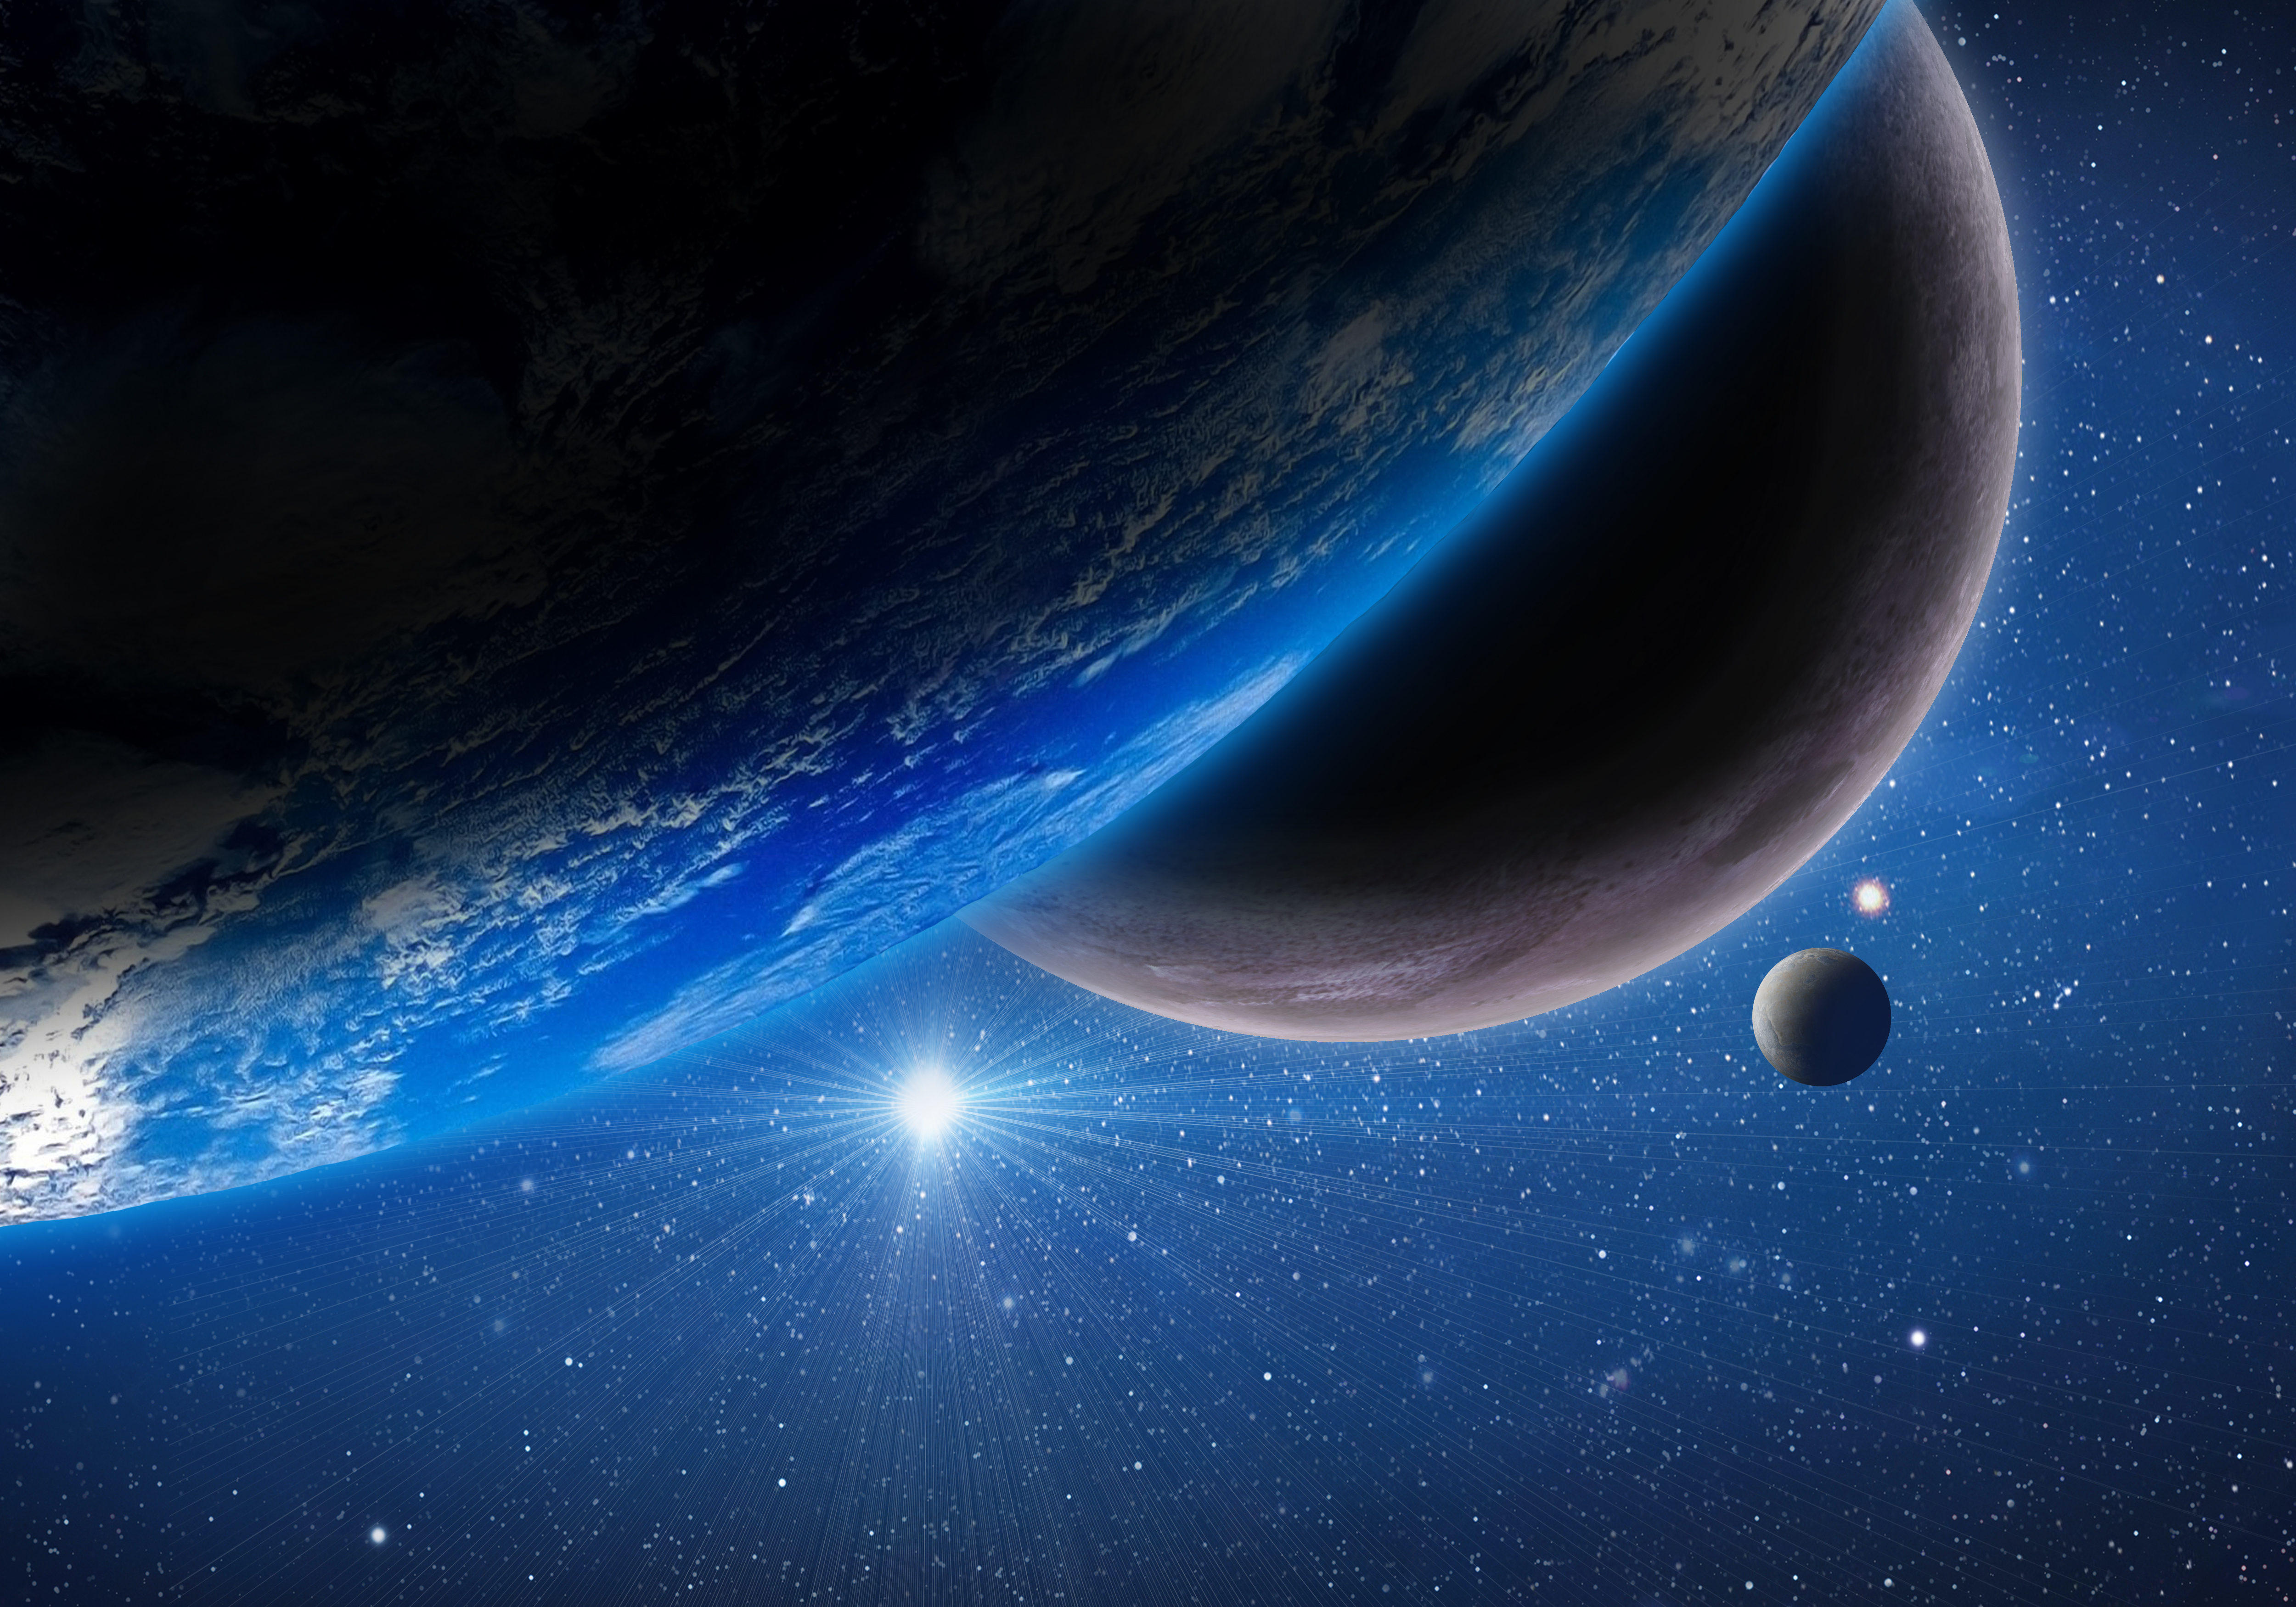 Pianeti sfondi per pc 5000x3500 id 394958 for Sfondi pianeti hd